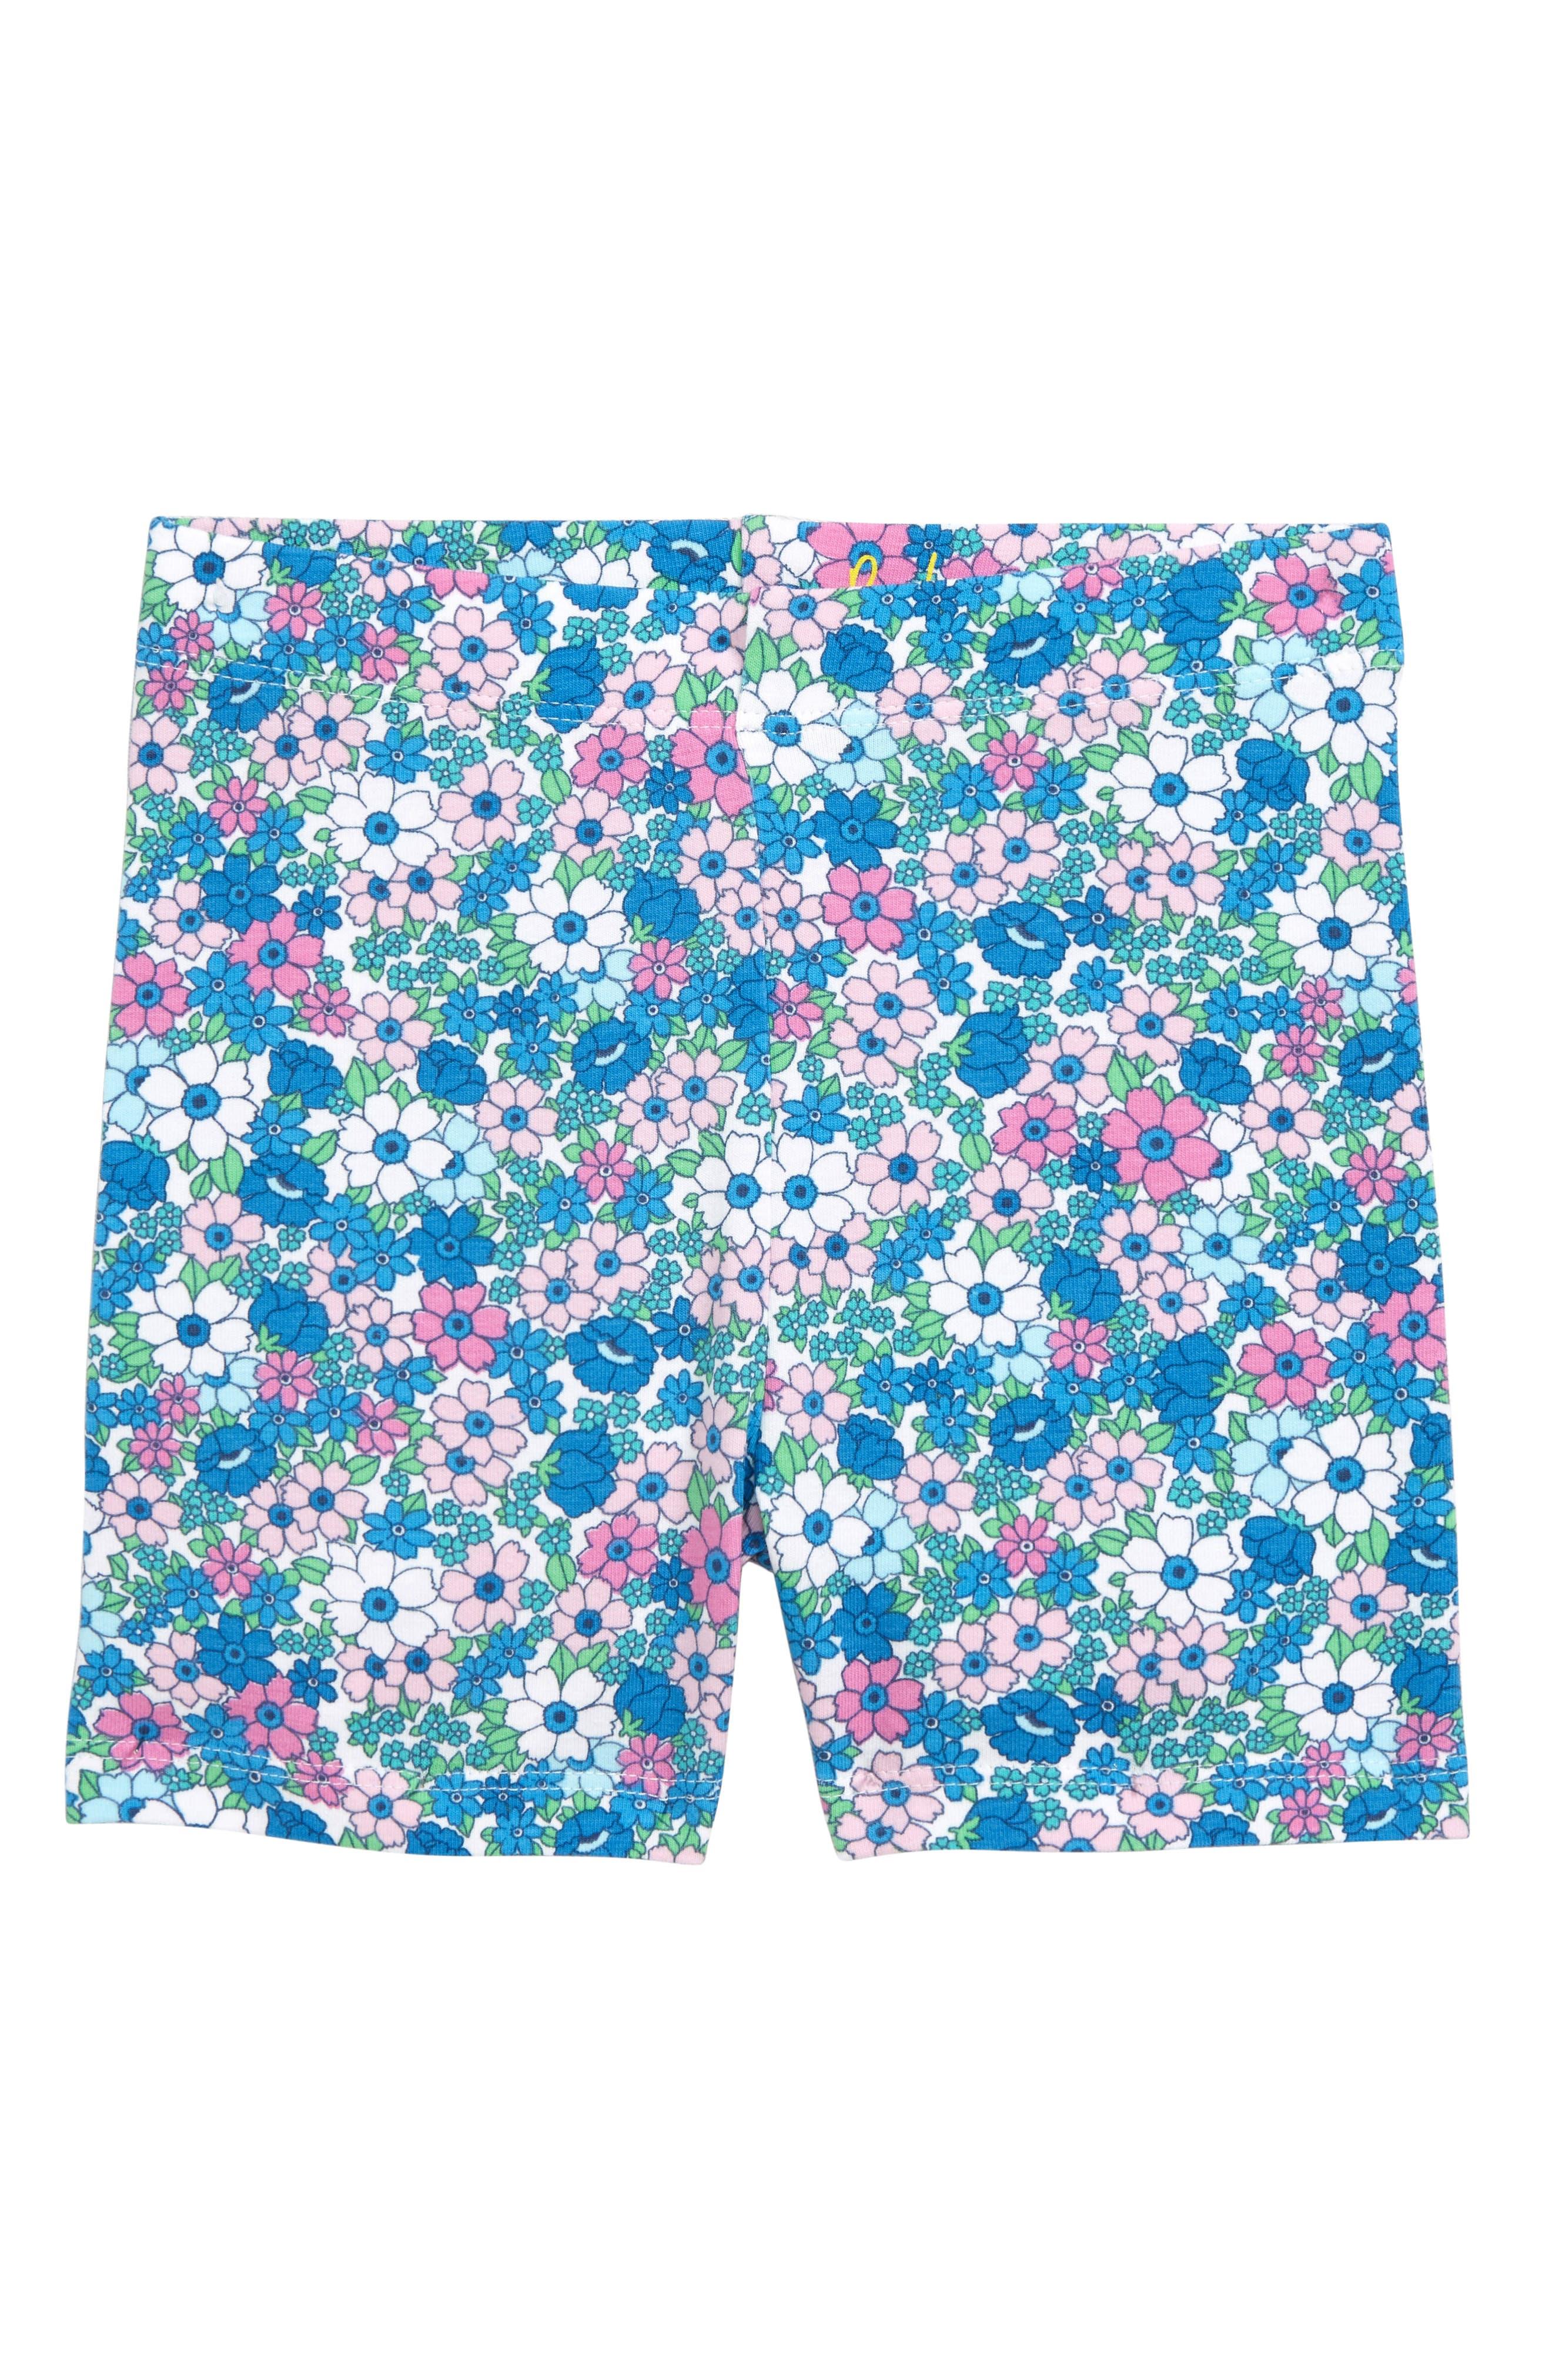 Girls Mini Boden Fun Jersey Shorts Size 1112Y  Blue